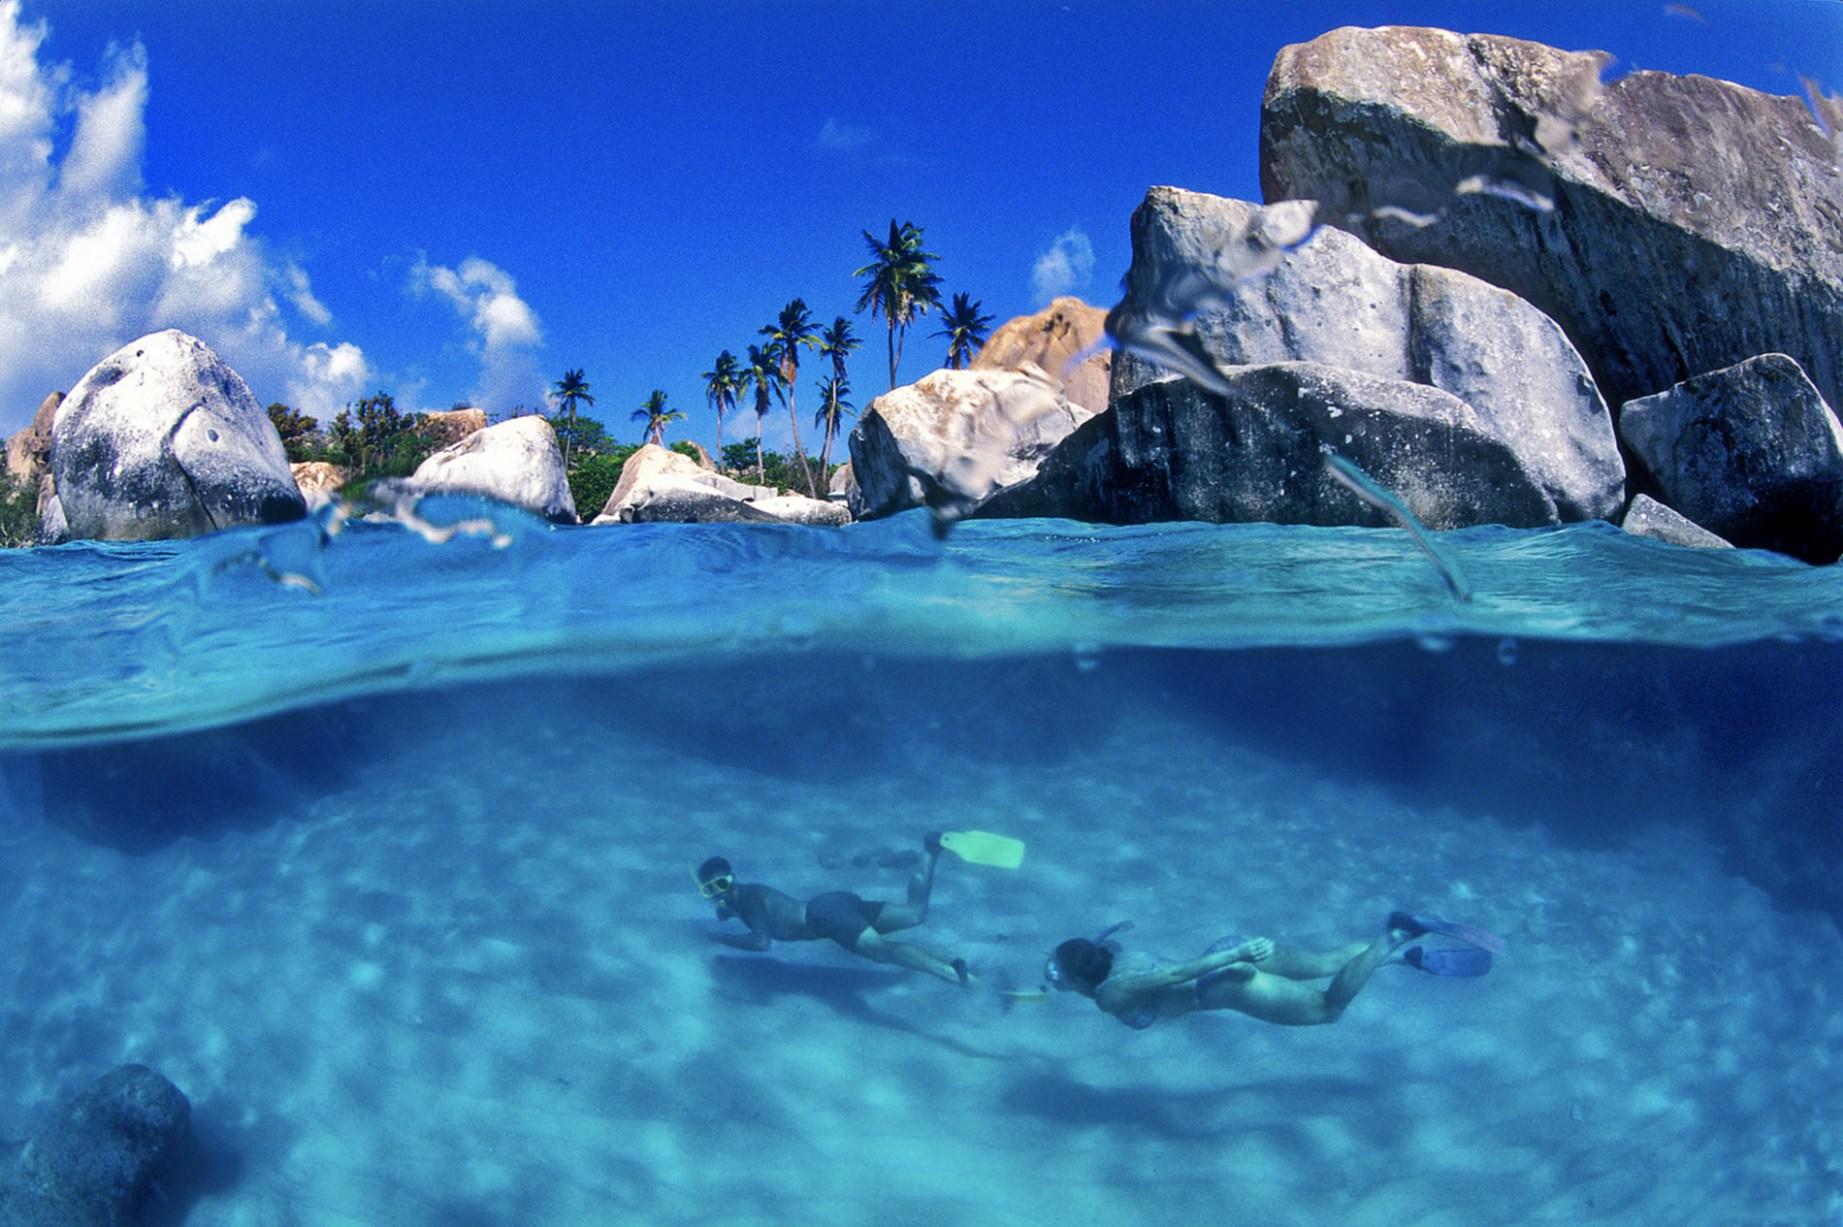 baths-bvi-yacht-sweet-escape-charter-luxury-destinations